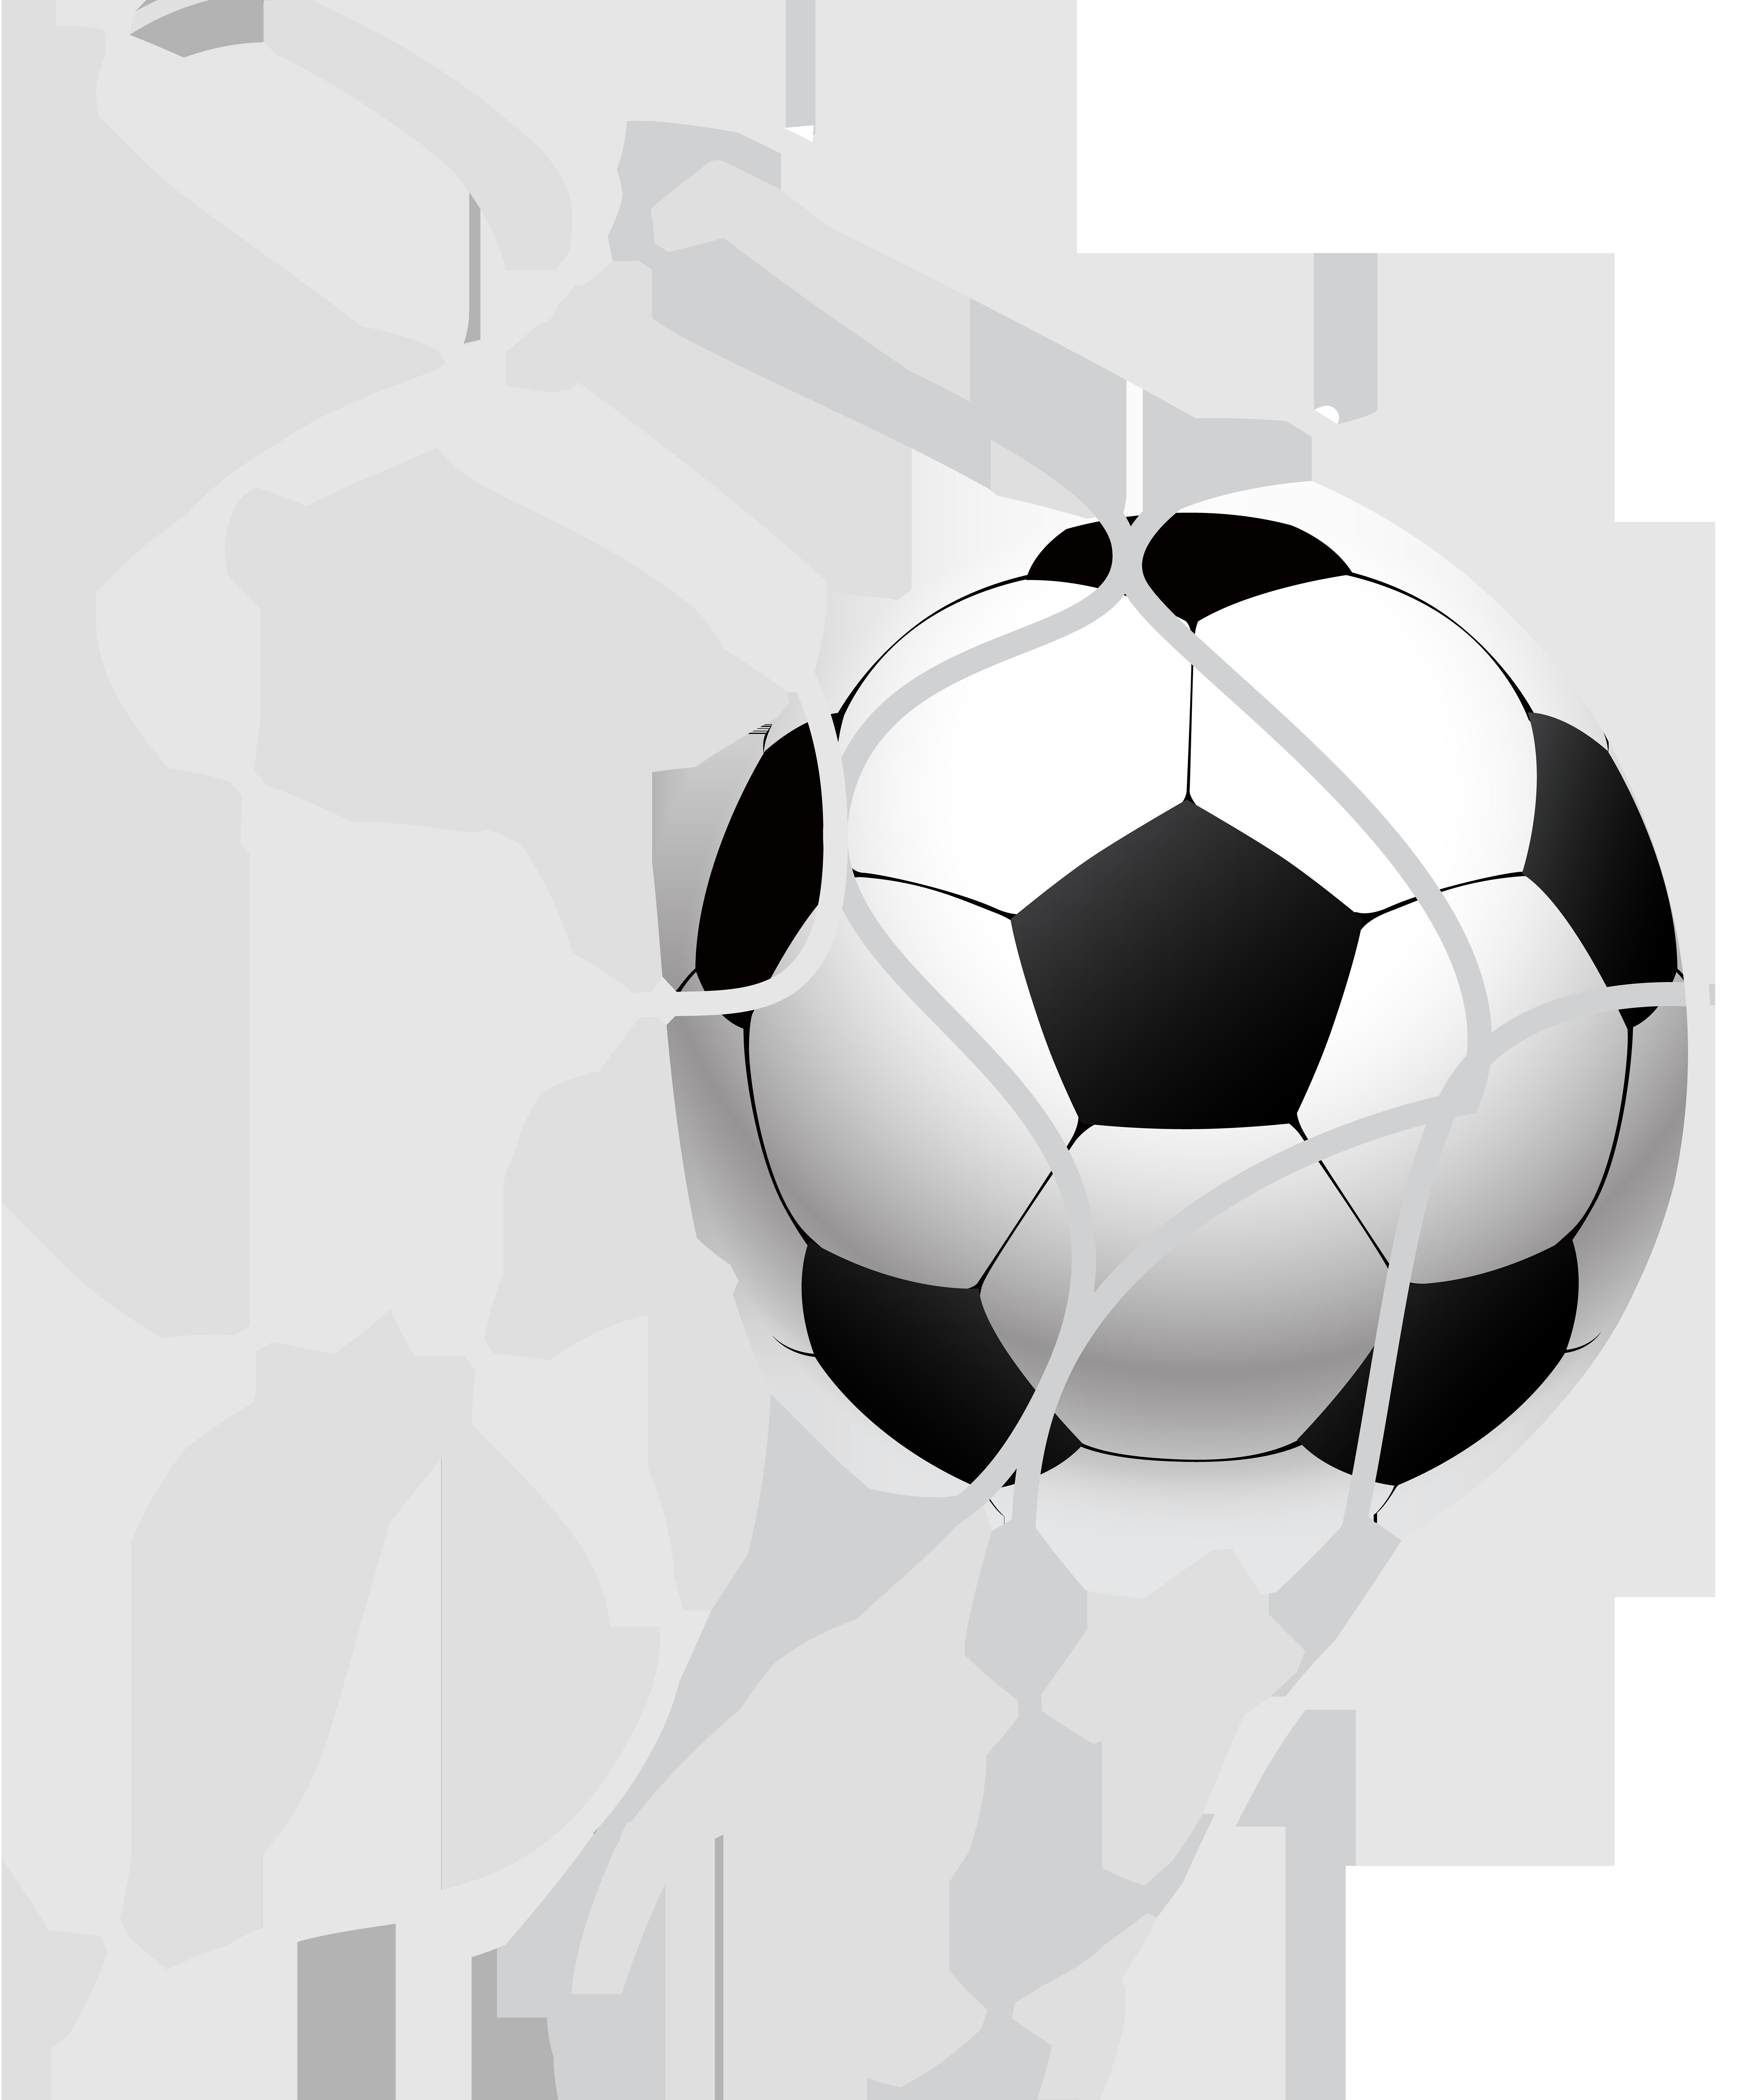 banner transparent download In a net png. Goal clipart soccer ball goal